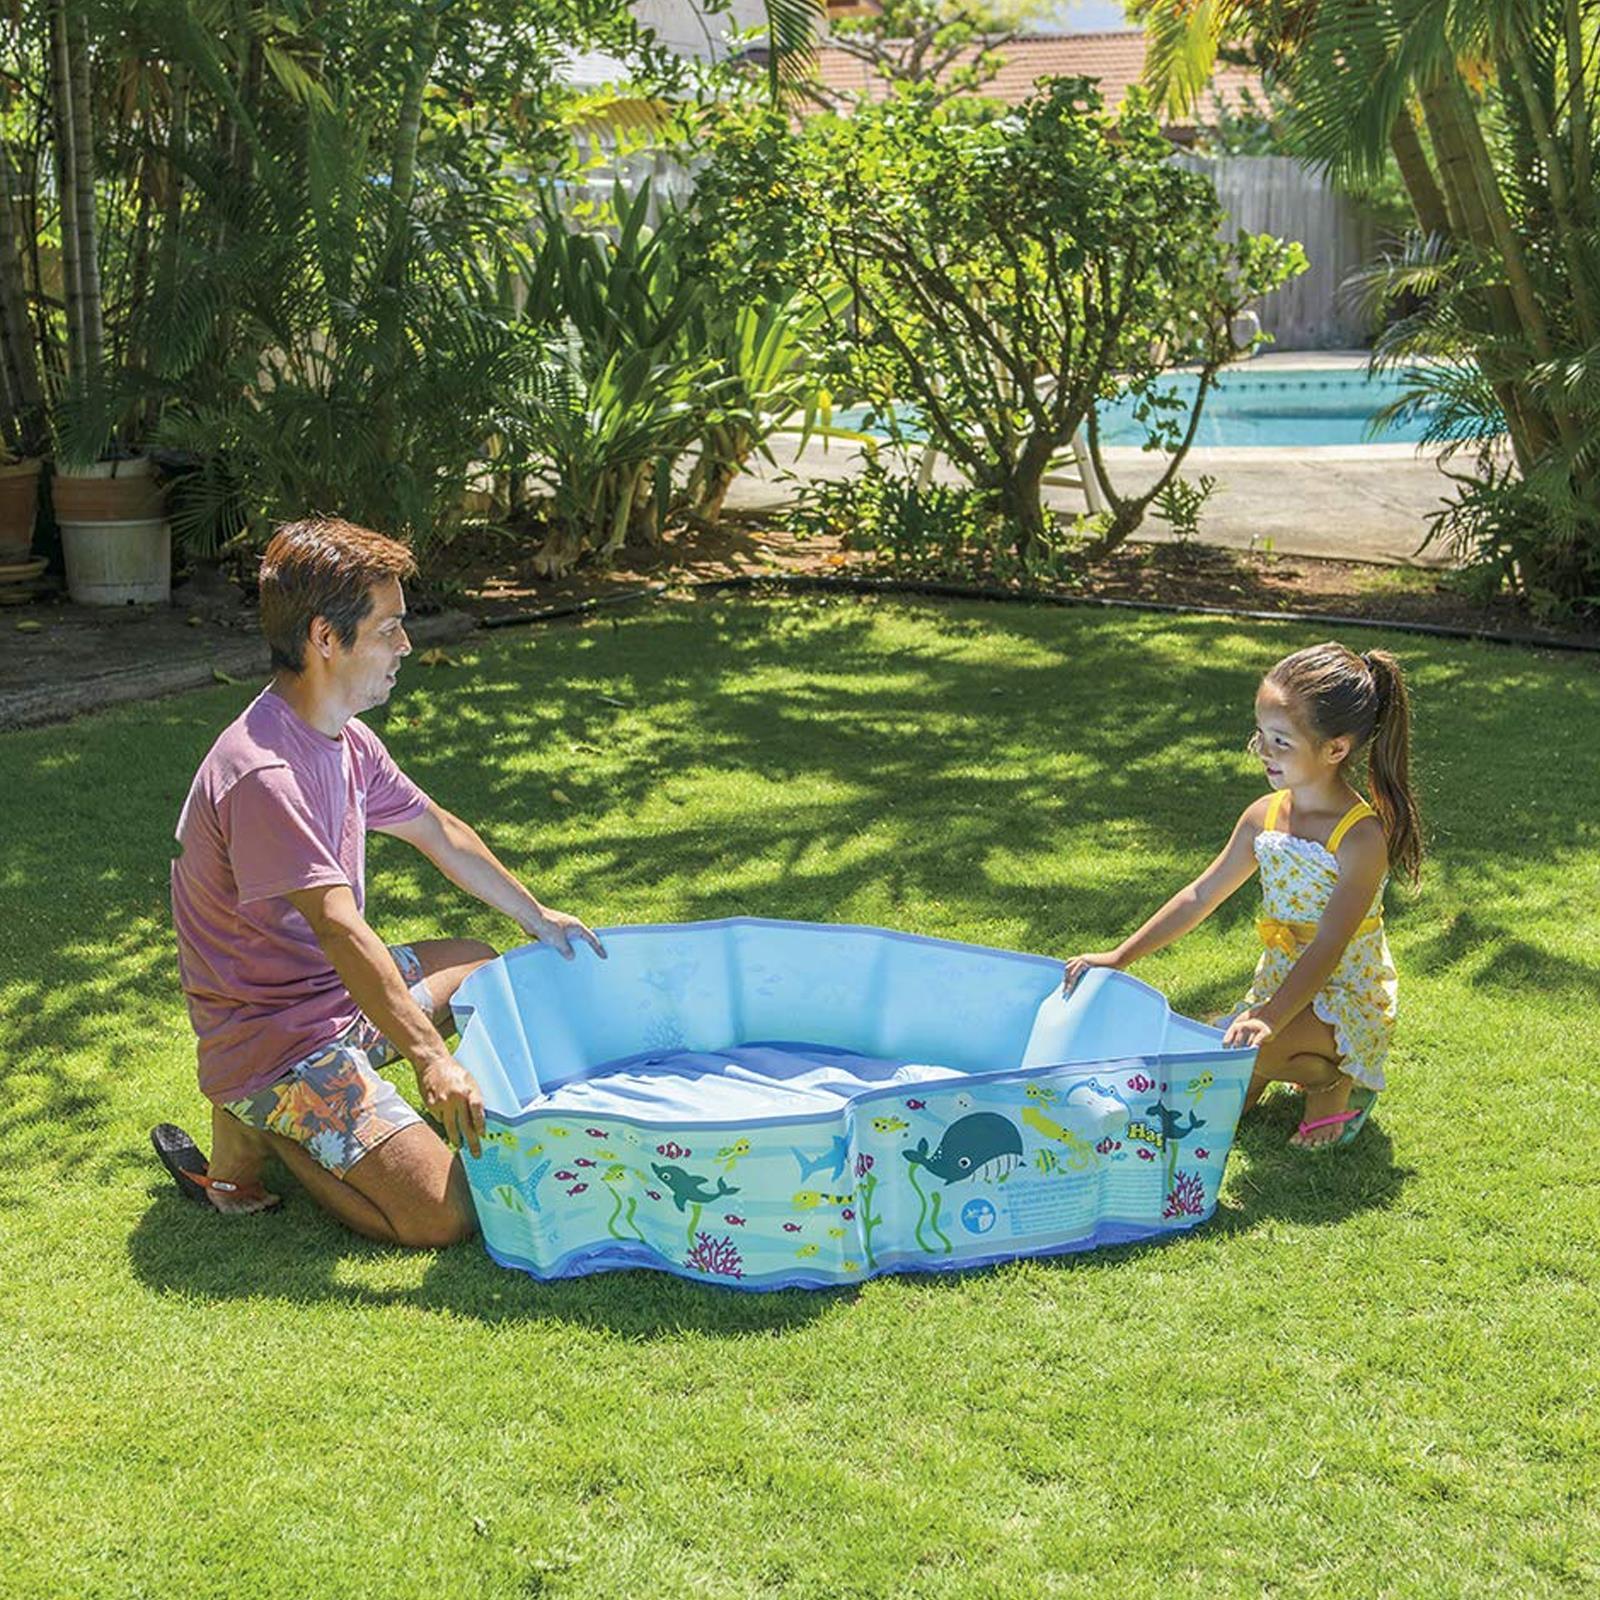 Centro-De-Juegos-De-Natacion-Ninos-Ridgid-Pared-piscina-infantil-Mar-Vida-al-Aire-Libre-diversion miniatura 3